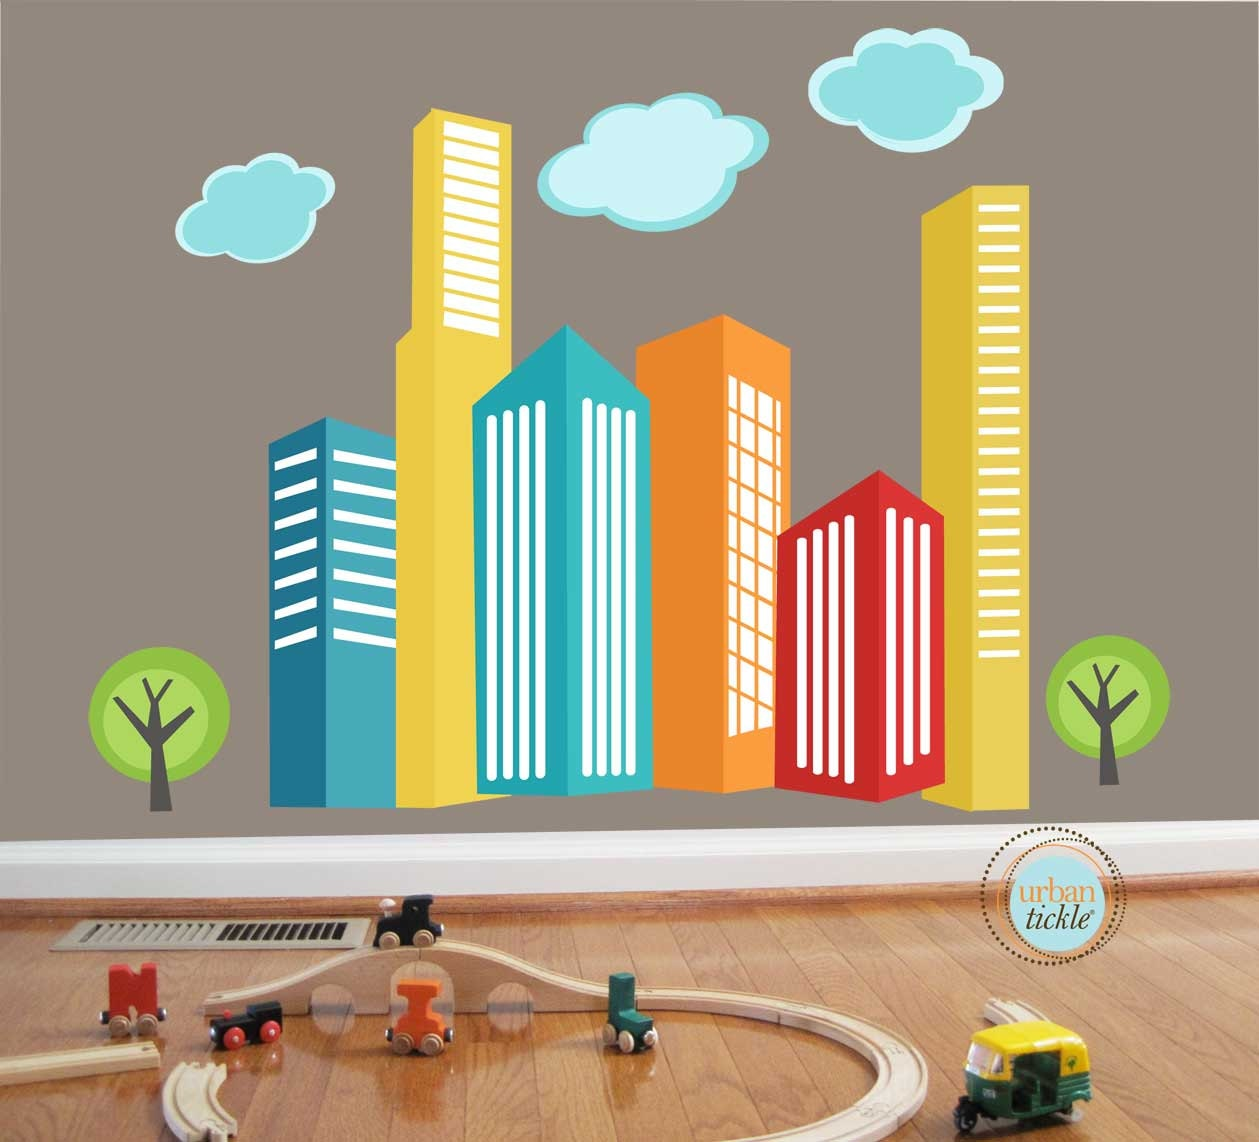 Diy Wall Decor For Playroom : City skyscrapers decals urban skyline small nursery wall